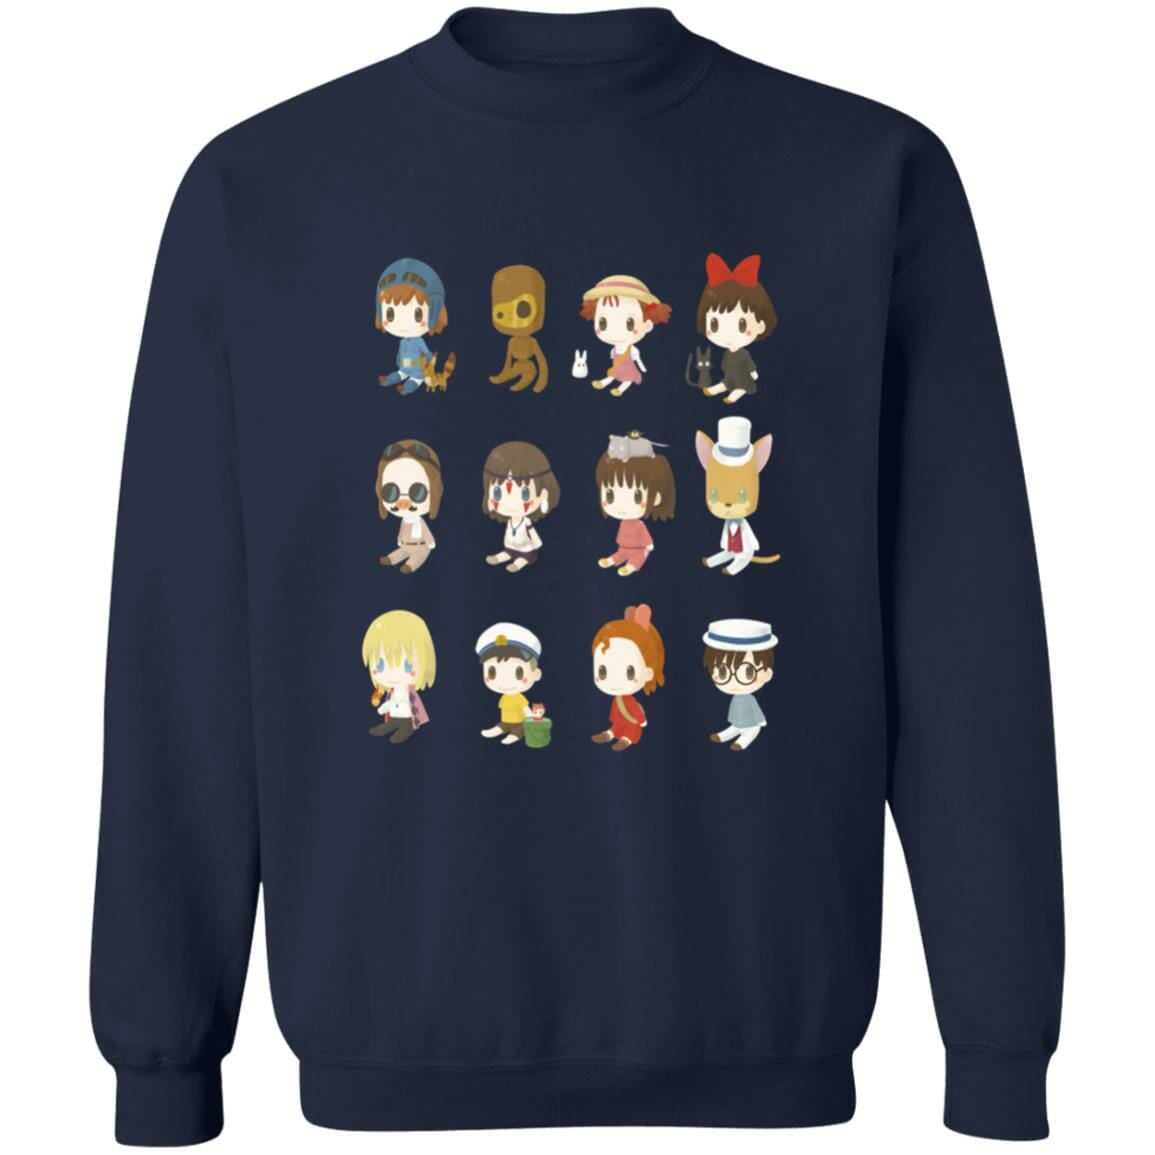 Ghibli Characters Cute Collection Sweatshirt